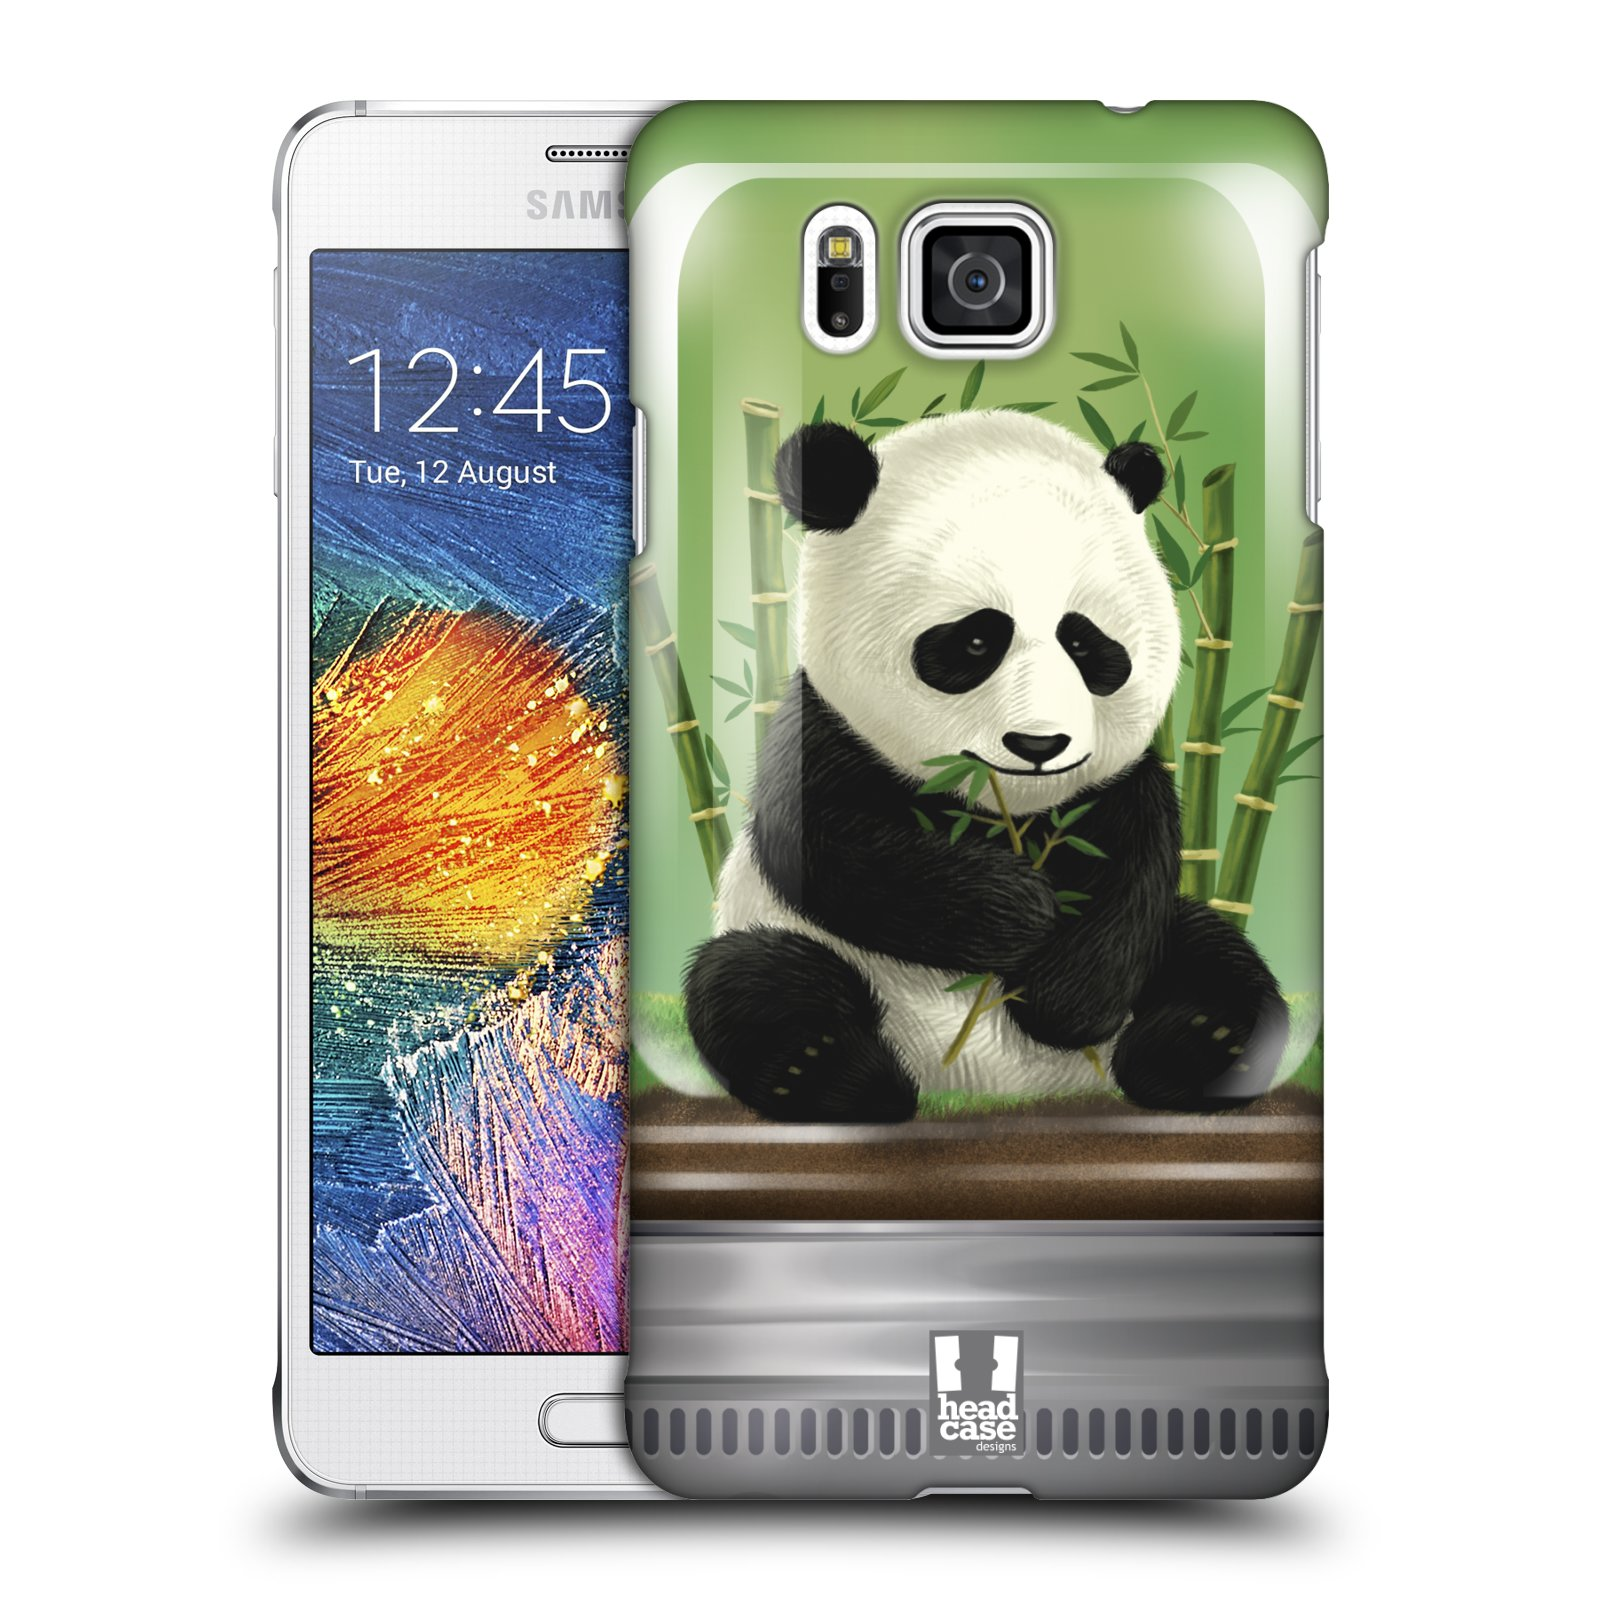 HEAD CASE plastový obal na mobil SAMSUNG Galaxy Alpha (G850) vzor Zvířátka v těžítku panda